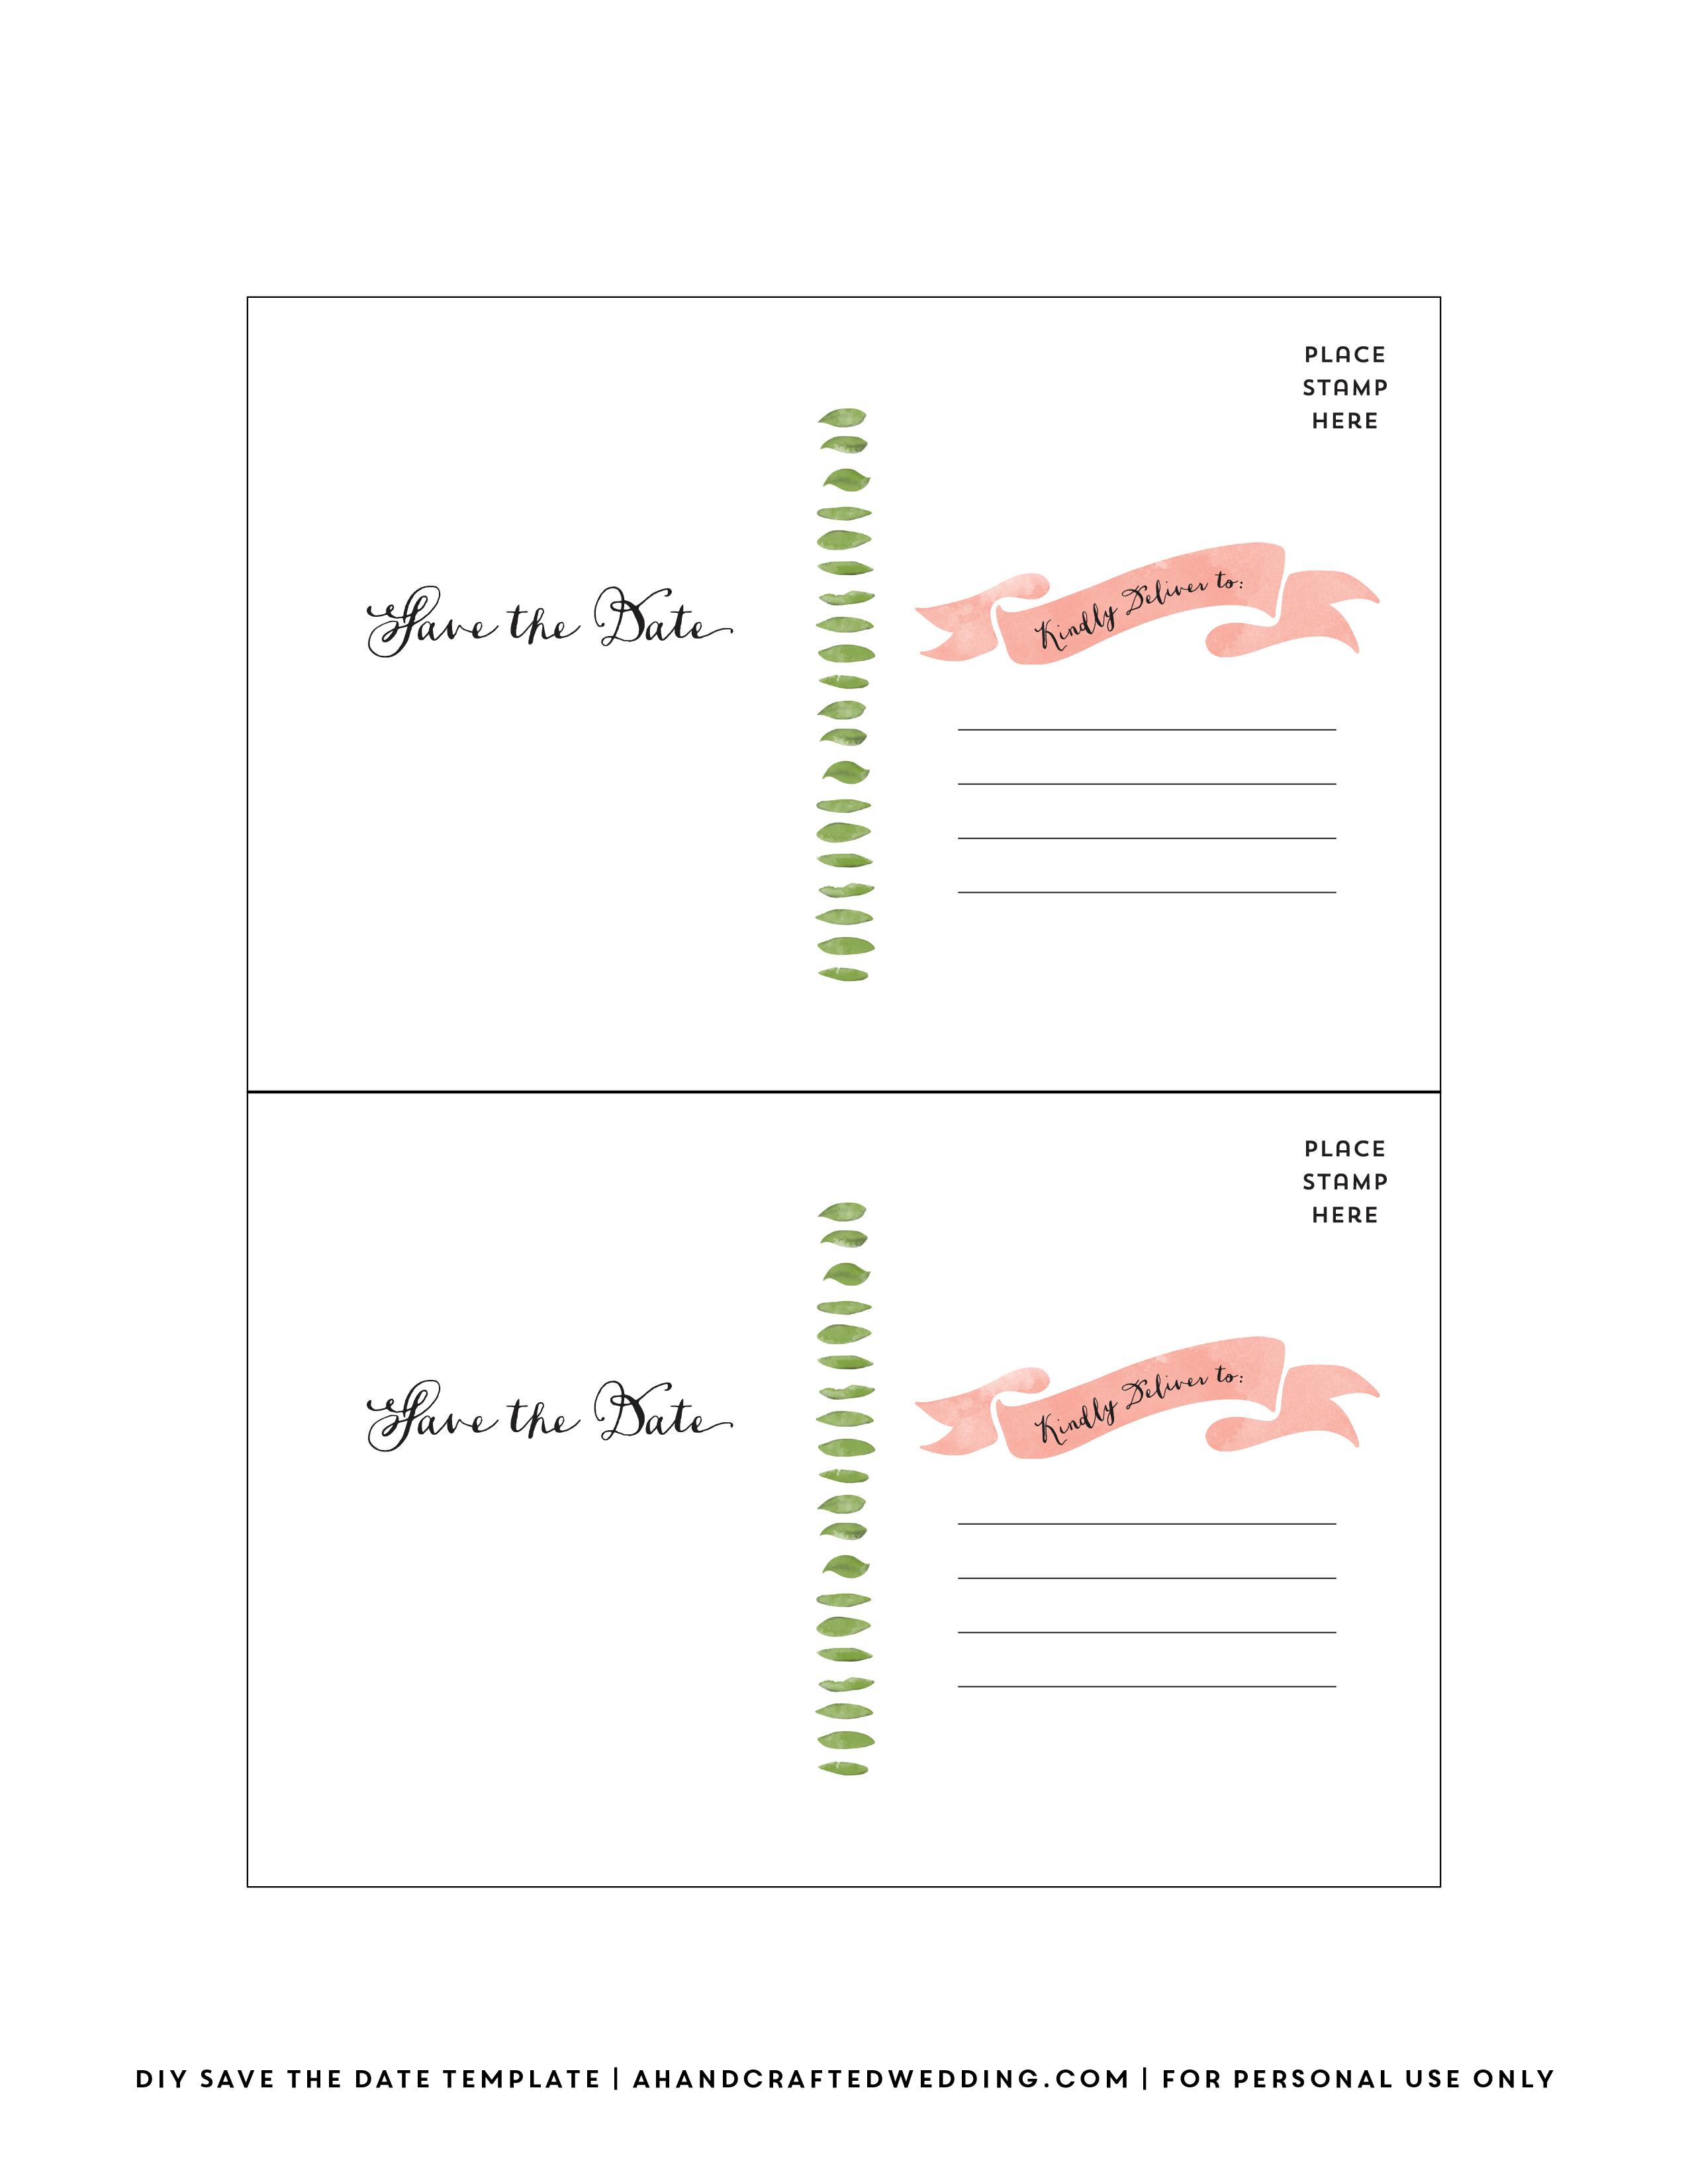 020 Template Ideas Free Postcard Back Photo Illustrator Templates - Free Printable Monster Templates